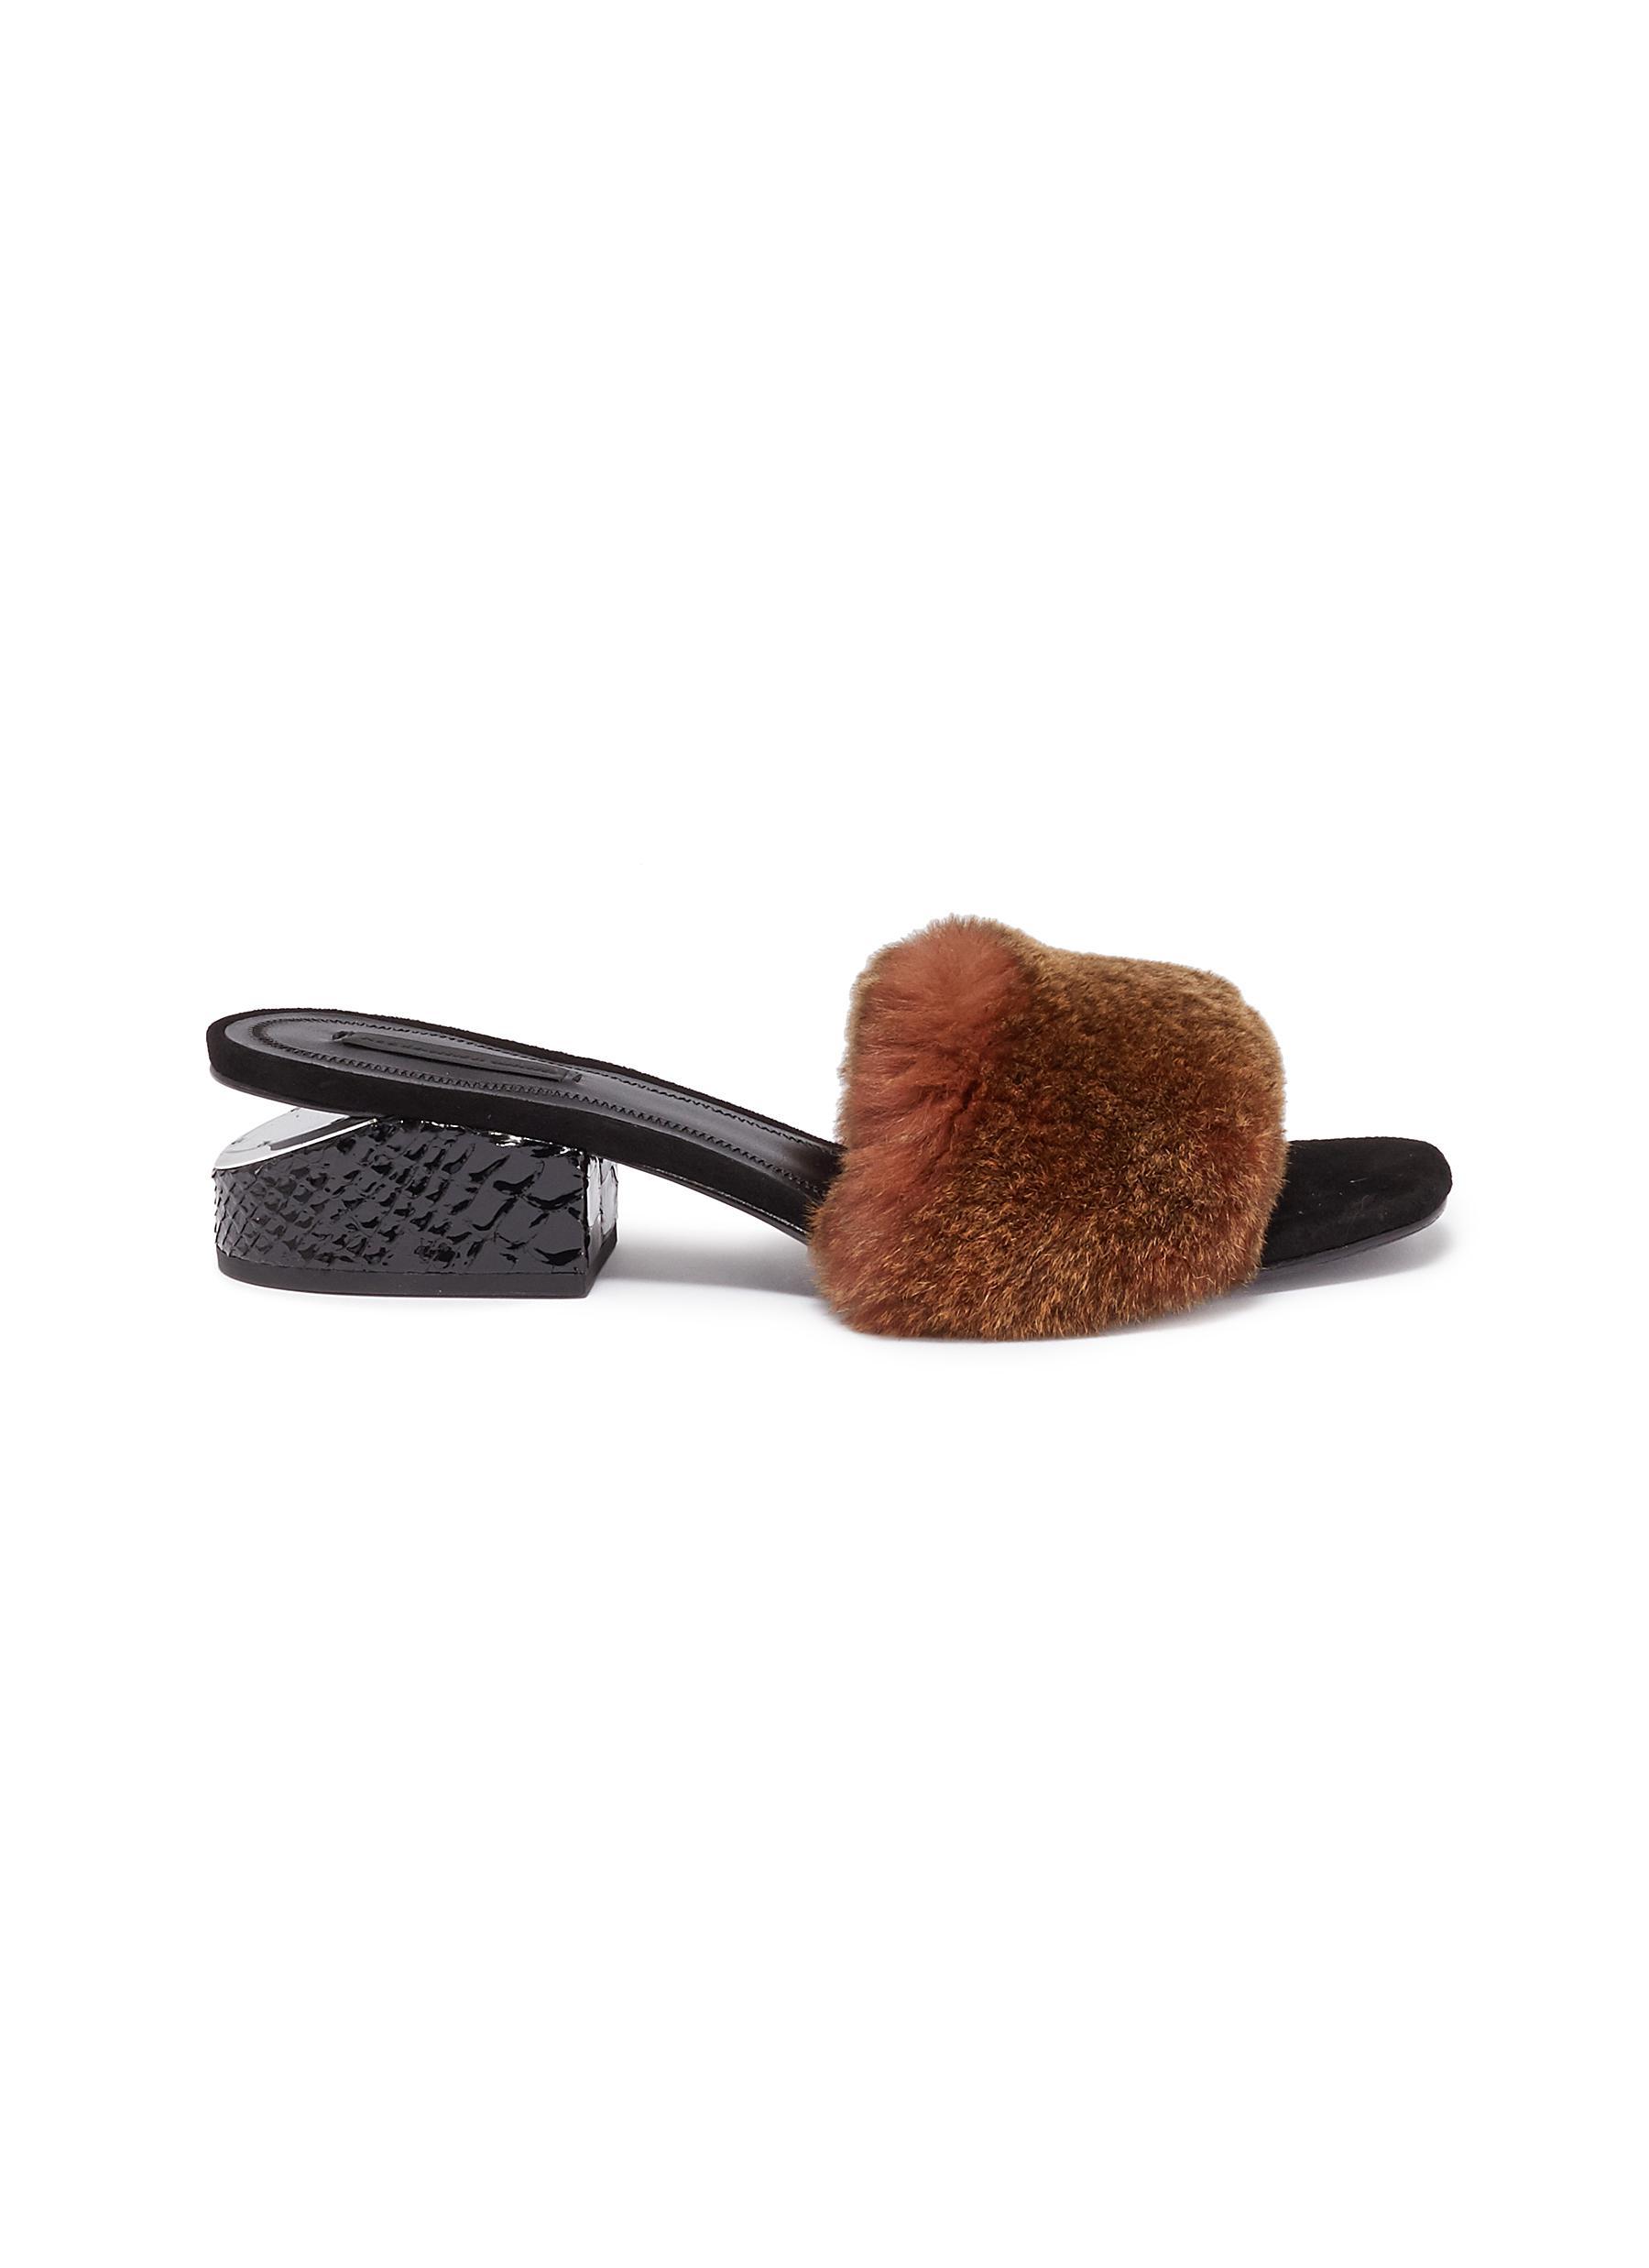 Lou snake embossed cutout heel rabbit fur sandals by Alexander Wang